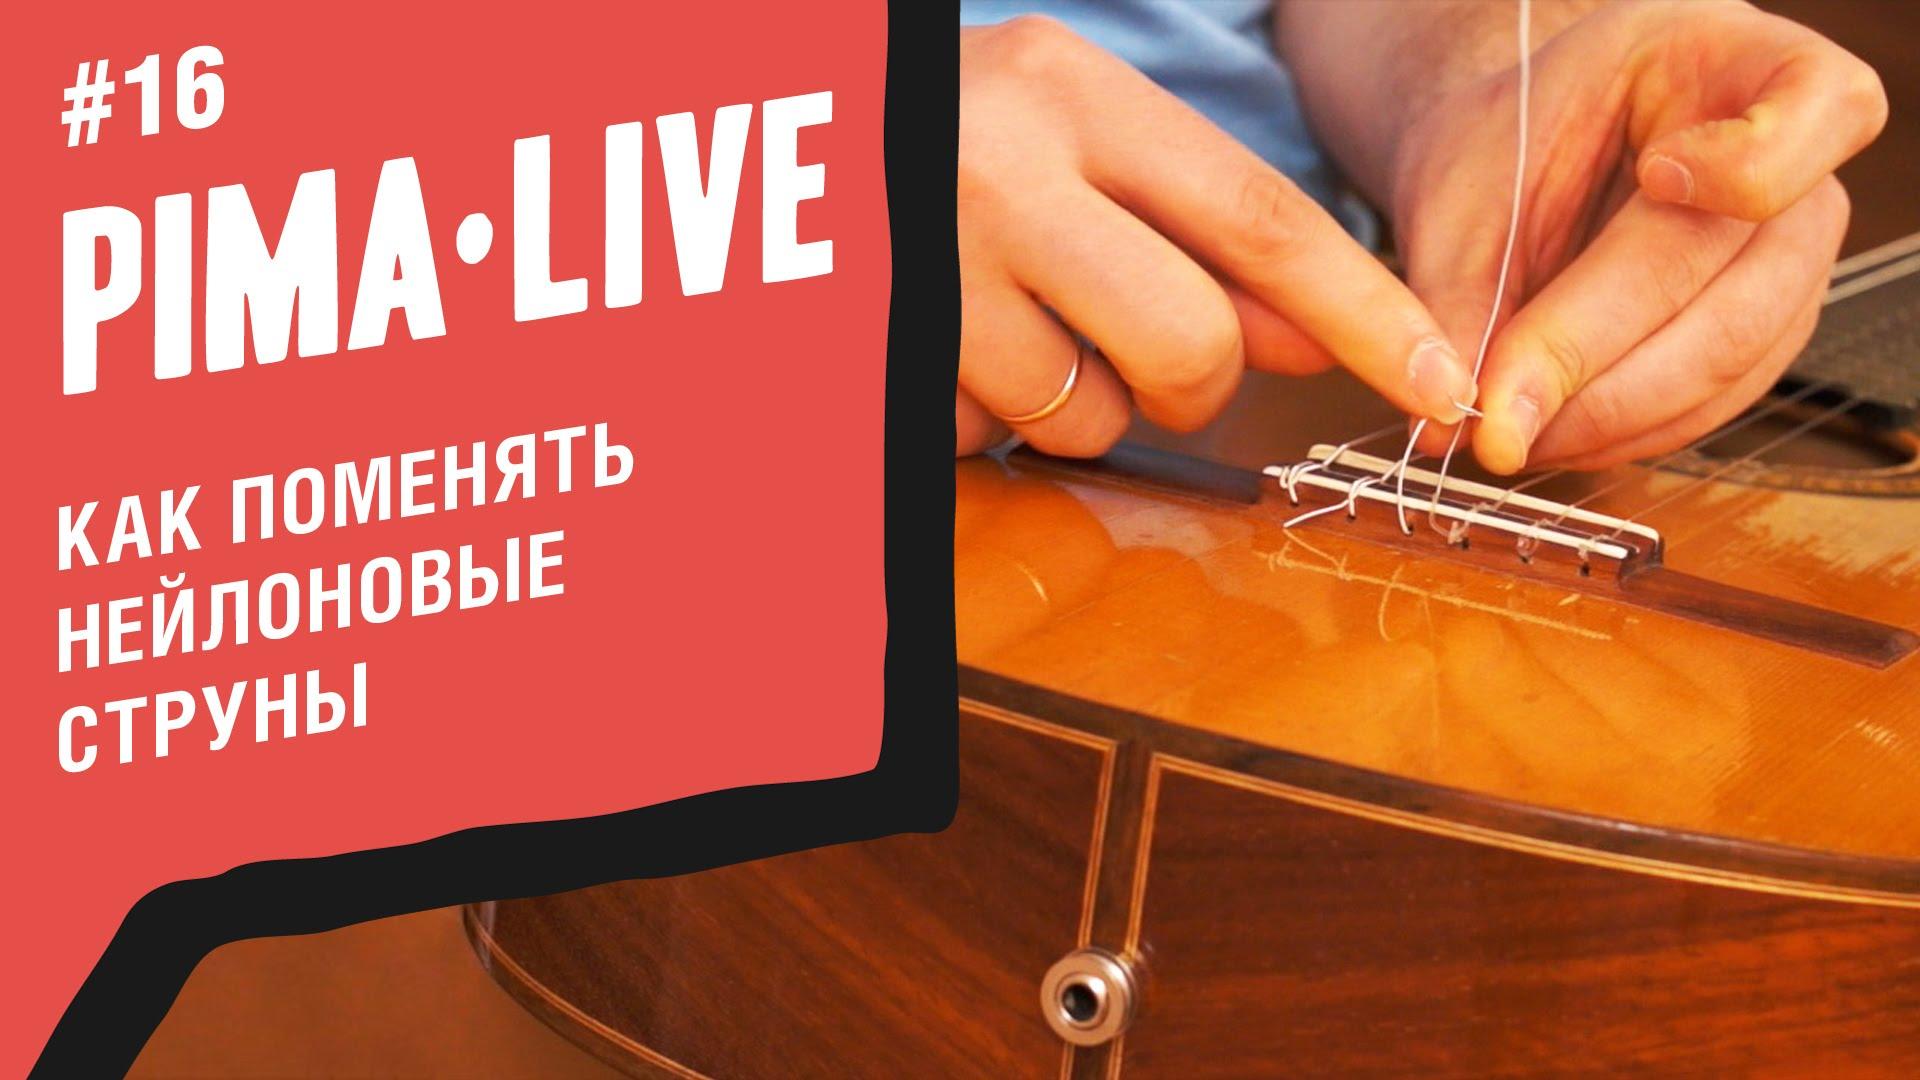 Замена струн на классической Гитаре — советы от Профи